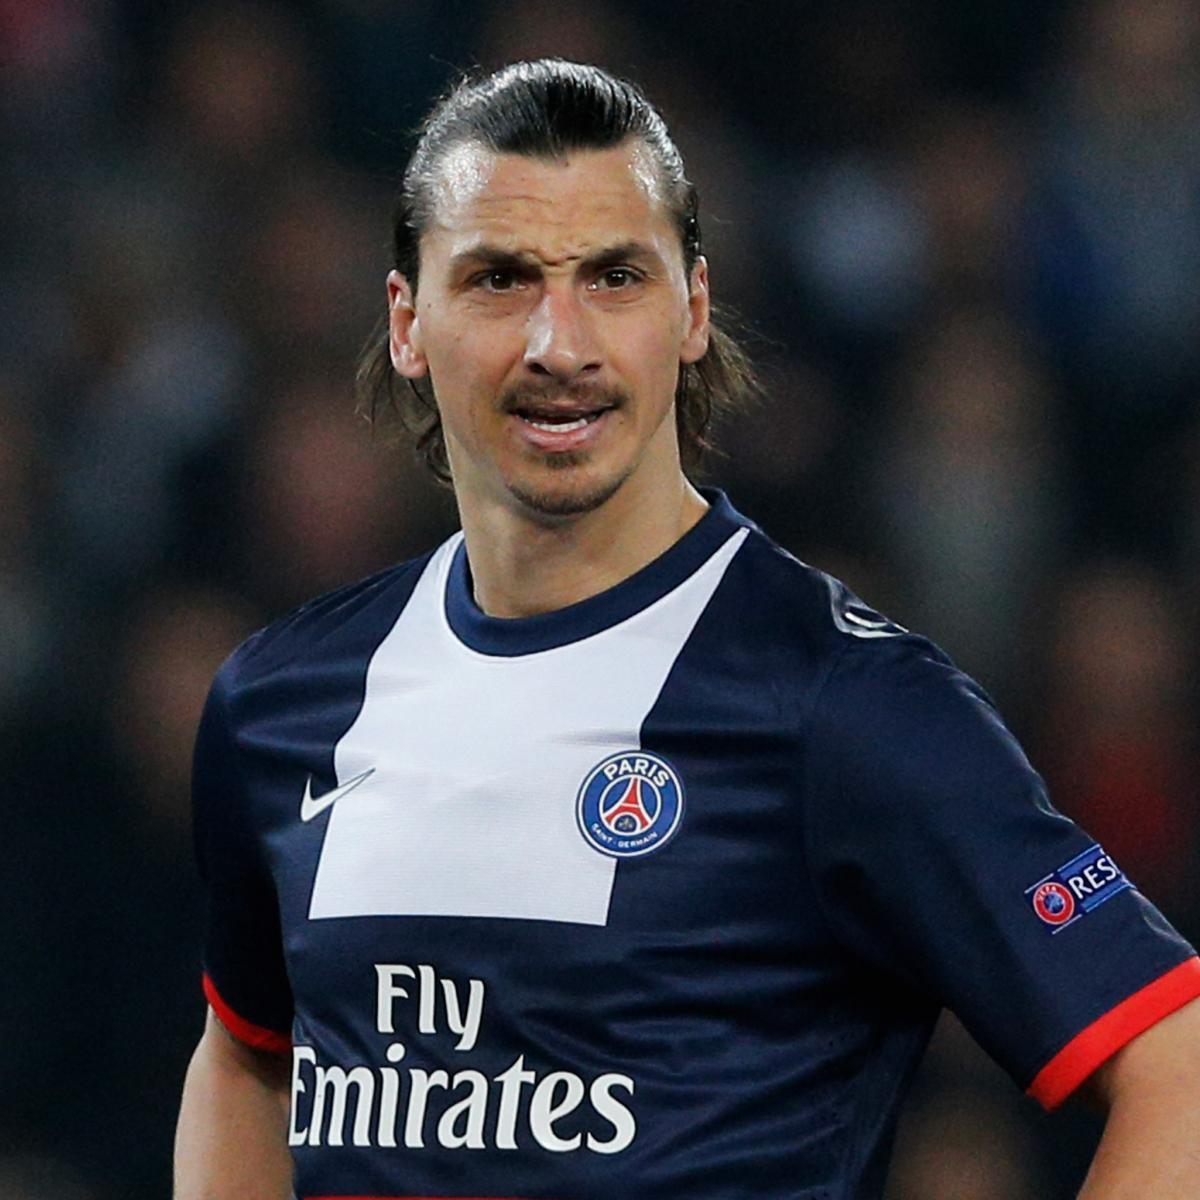 34b294752b4 10 Little-Known Facts About Paris Saint-Germain Forward Zlatan Ibrahimovic